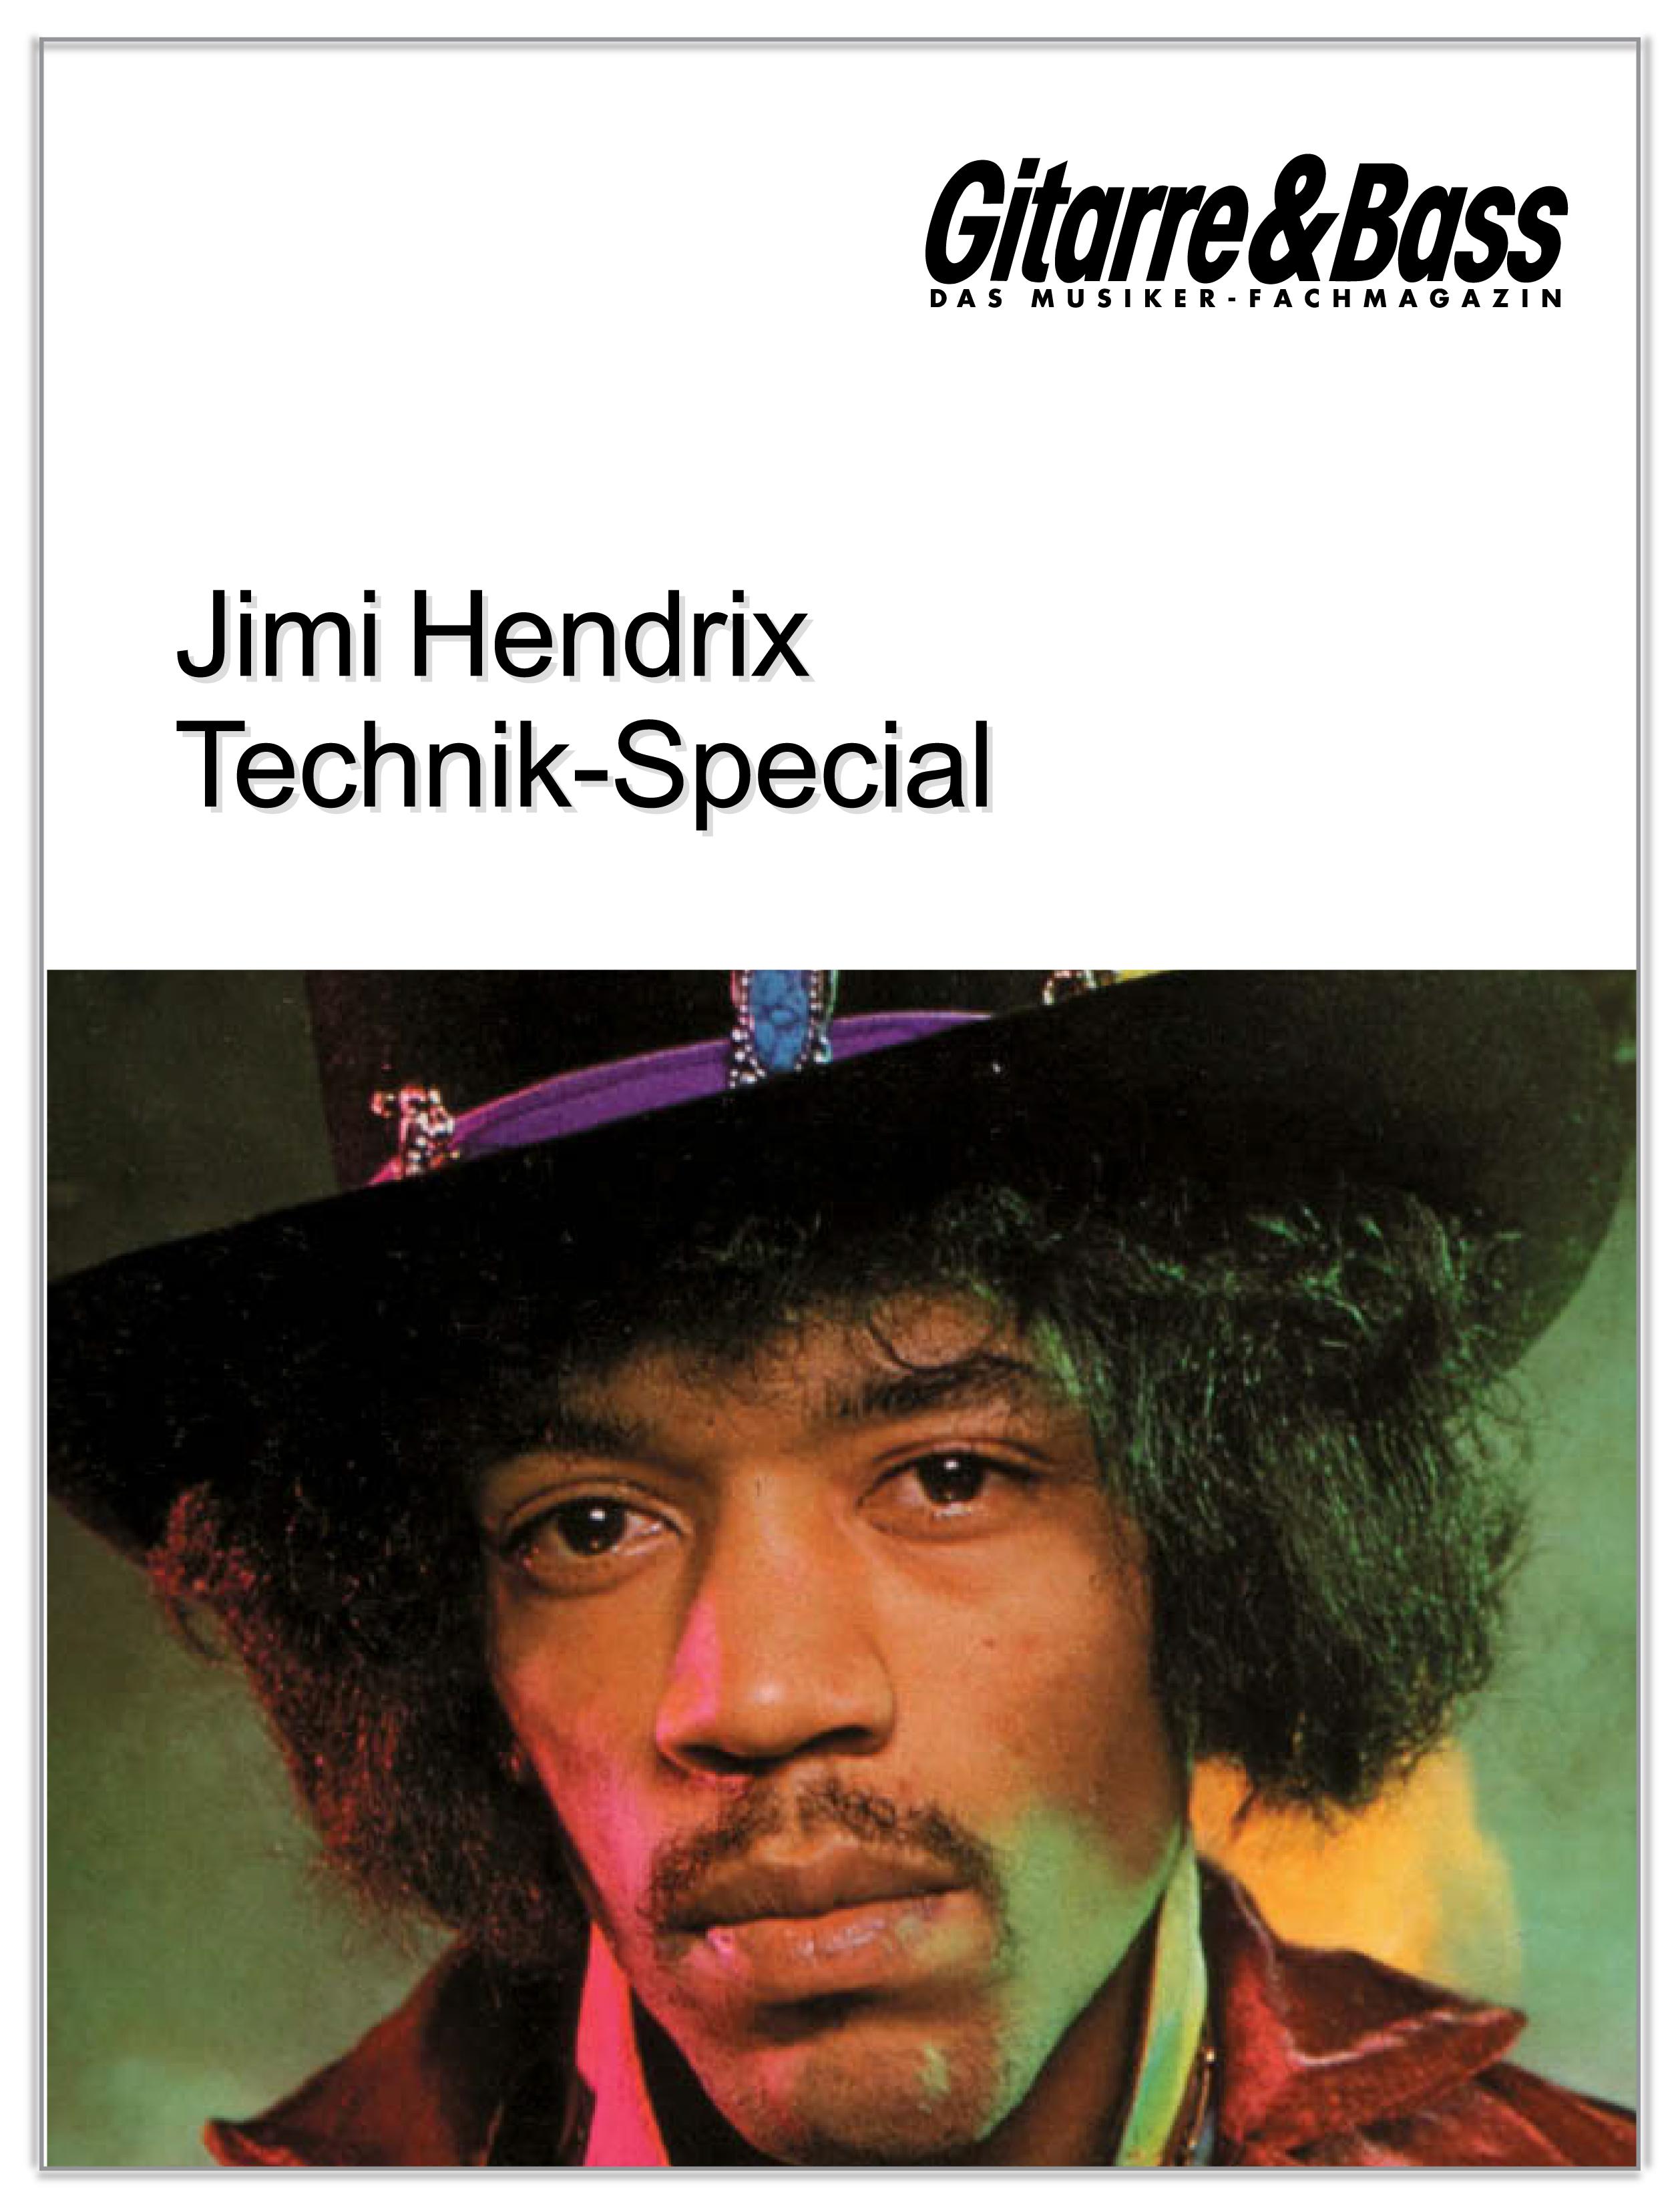 Produkt: Jimi Hendrix Technik